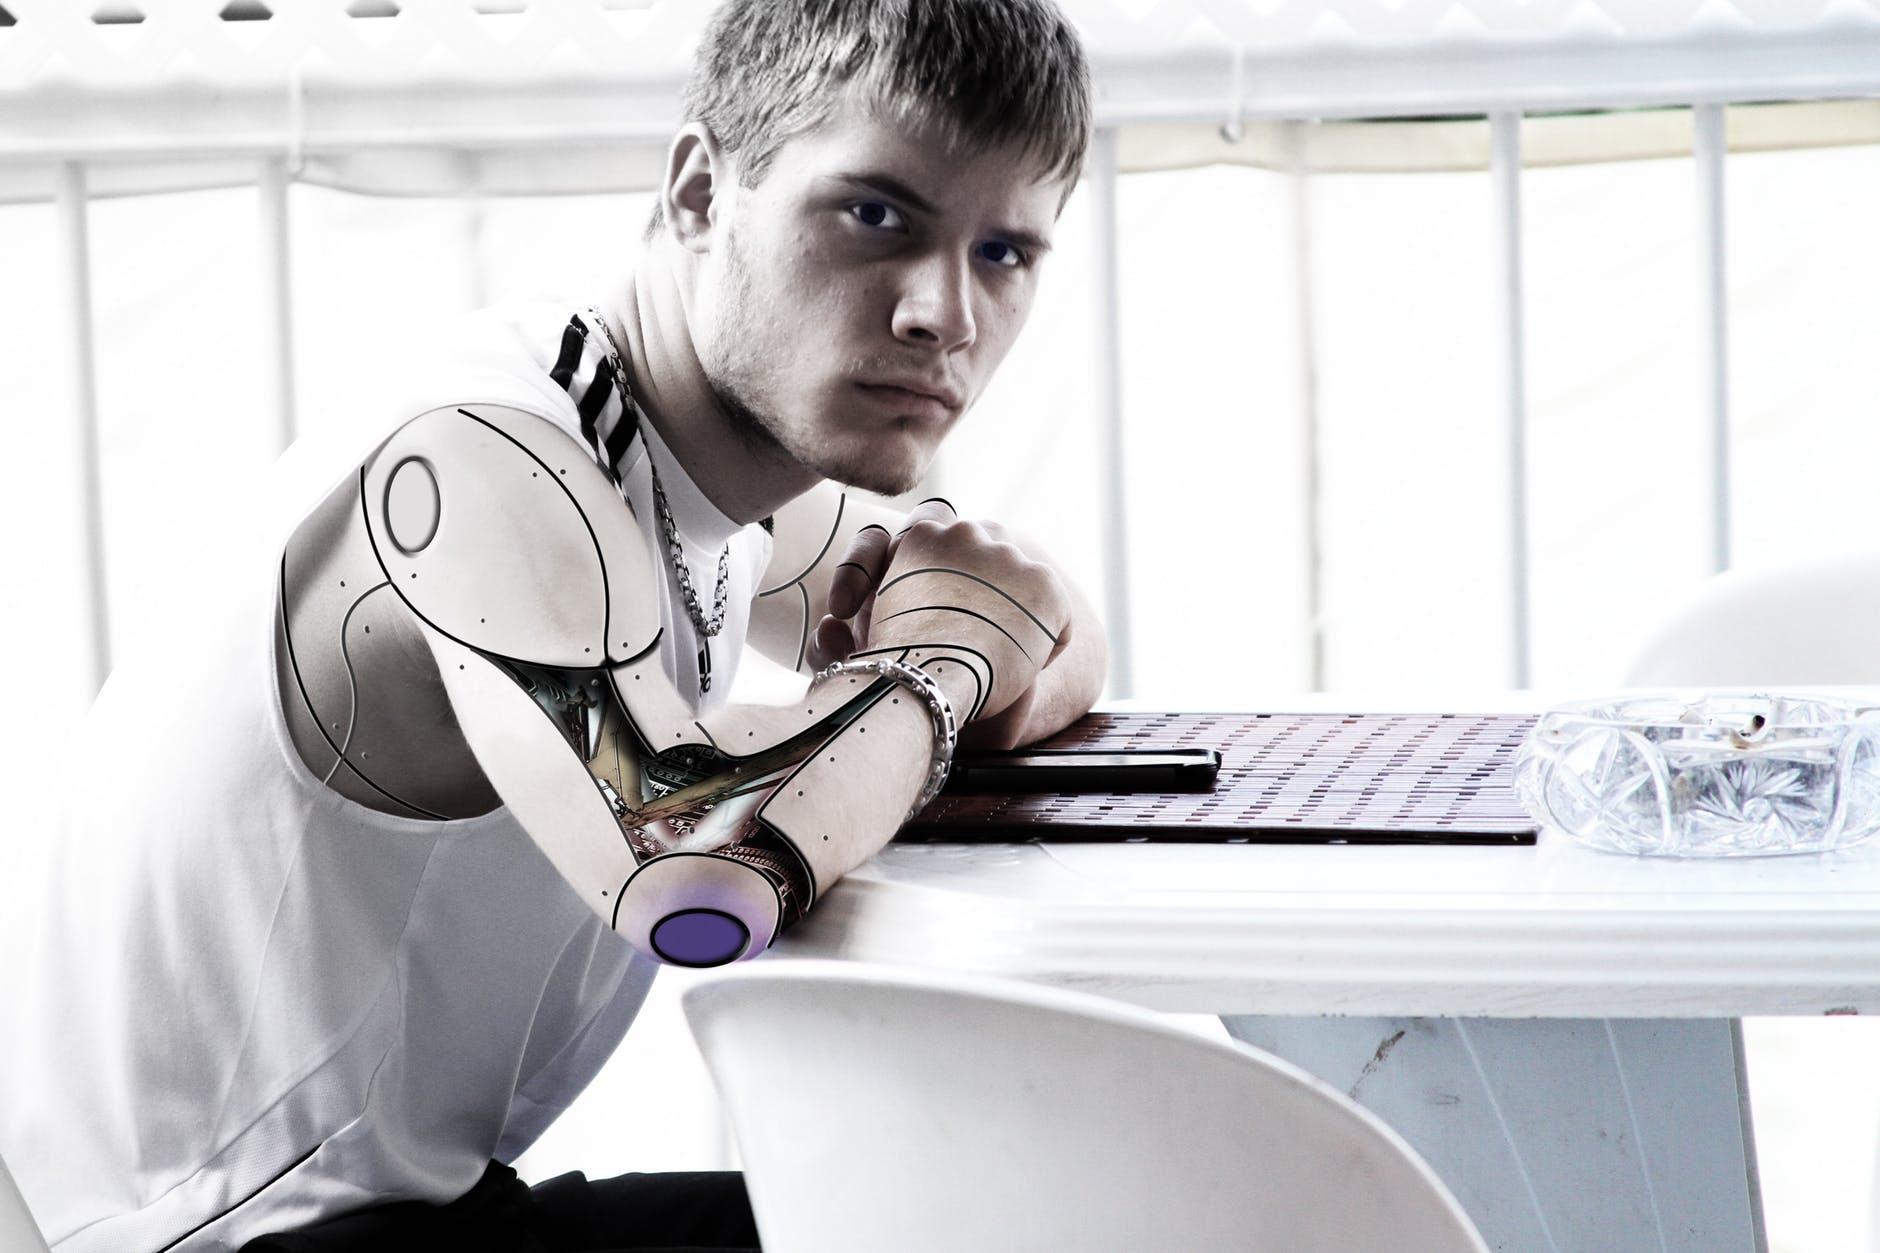 Transhumanism, a human right